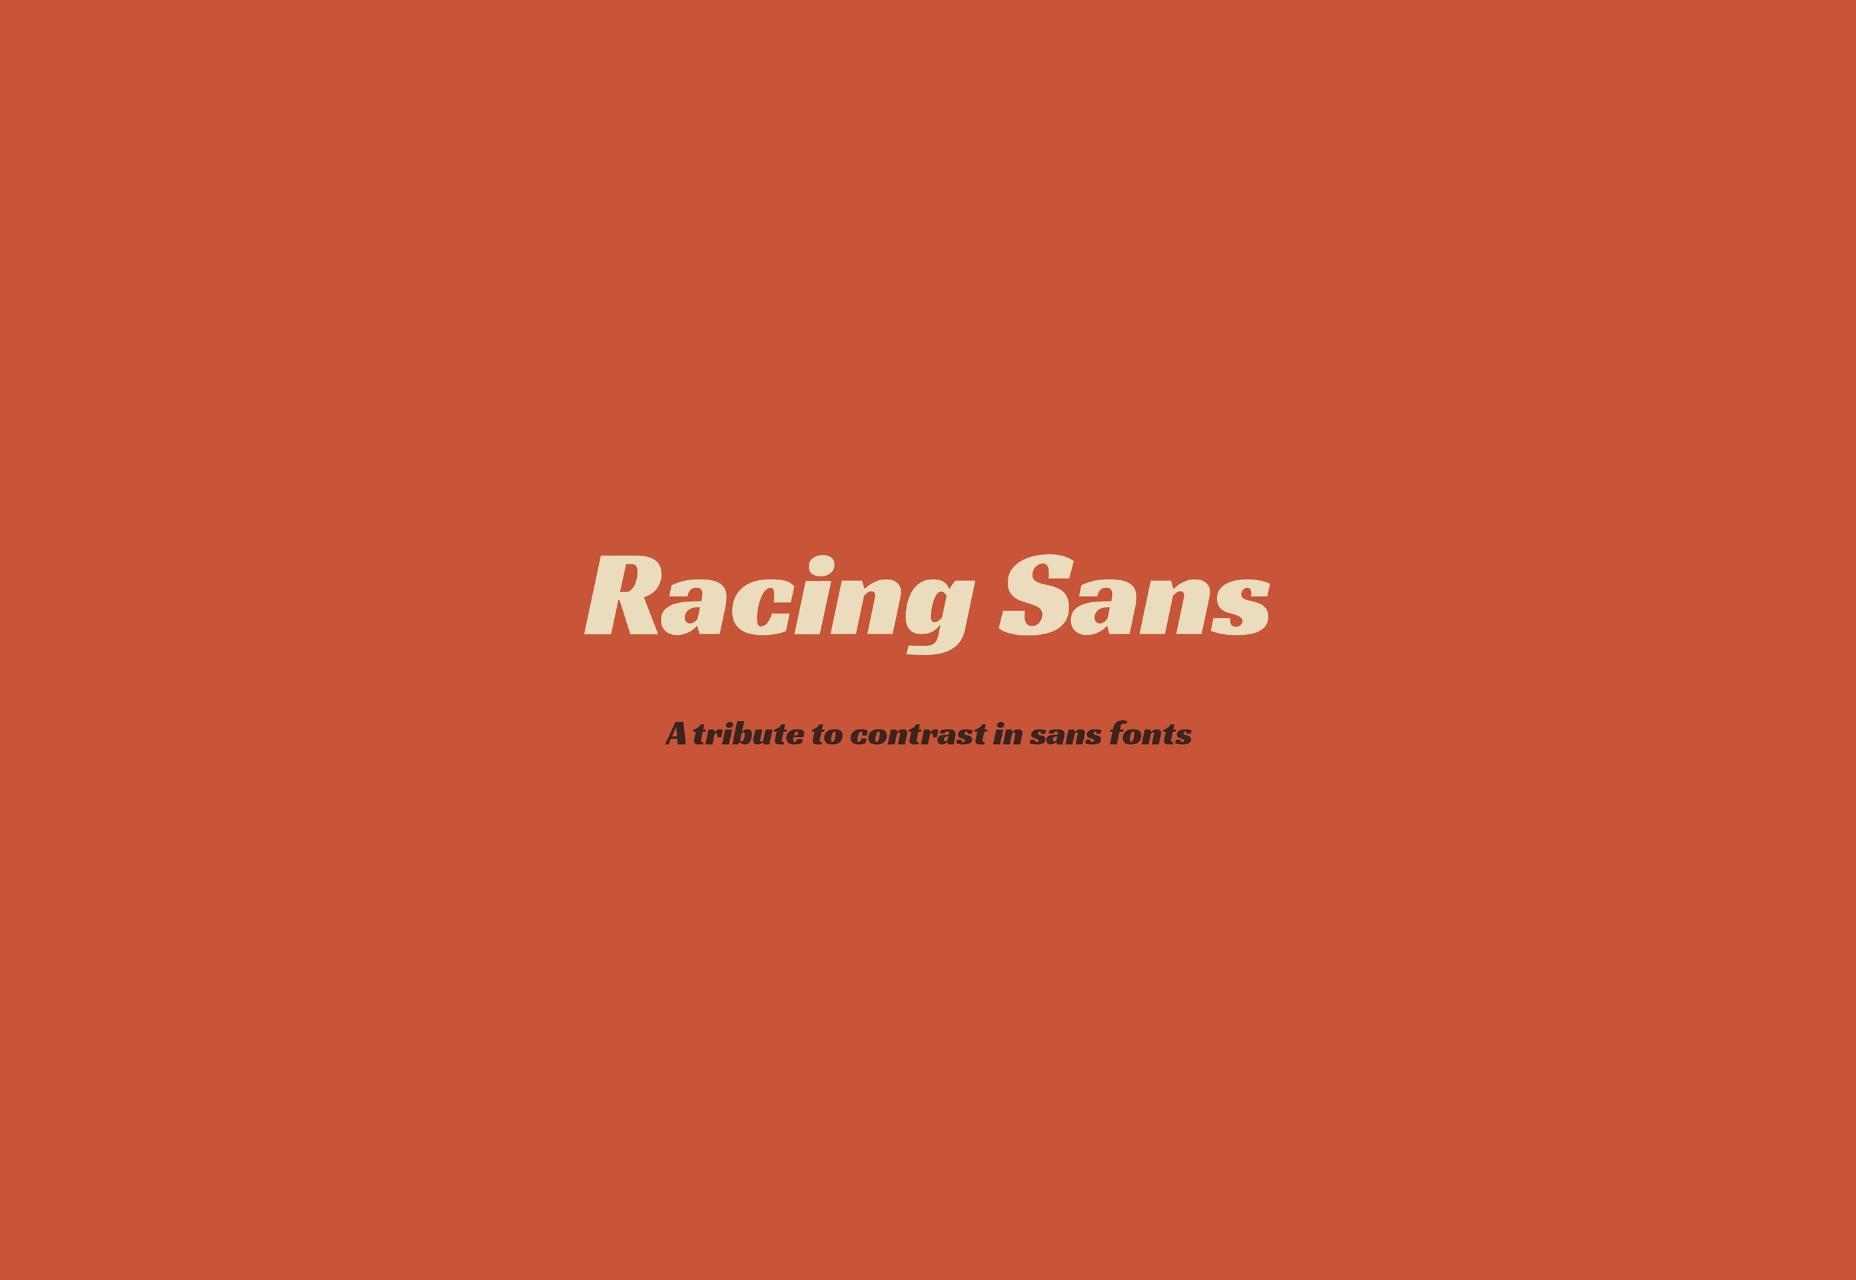 Racing Sans: Speeding Cars-inspired Open Font